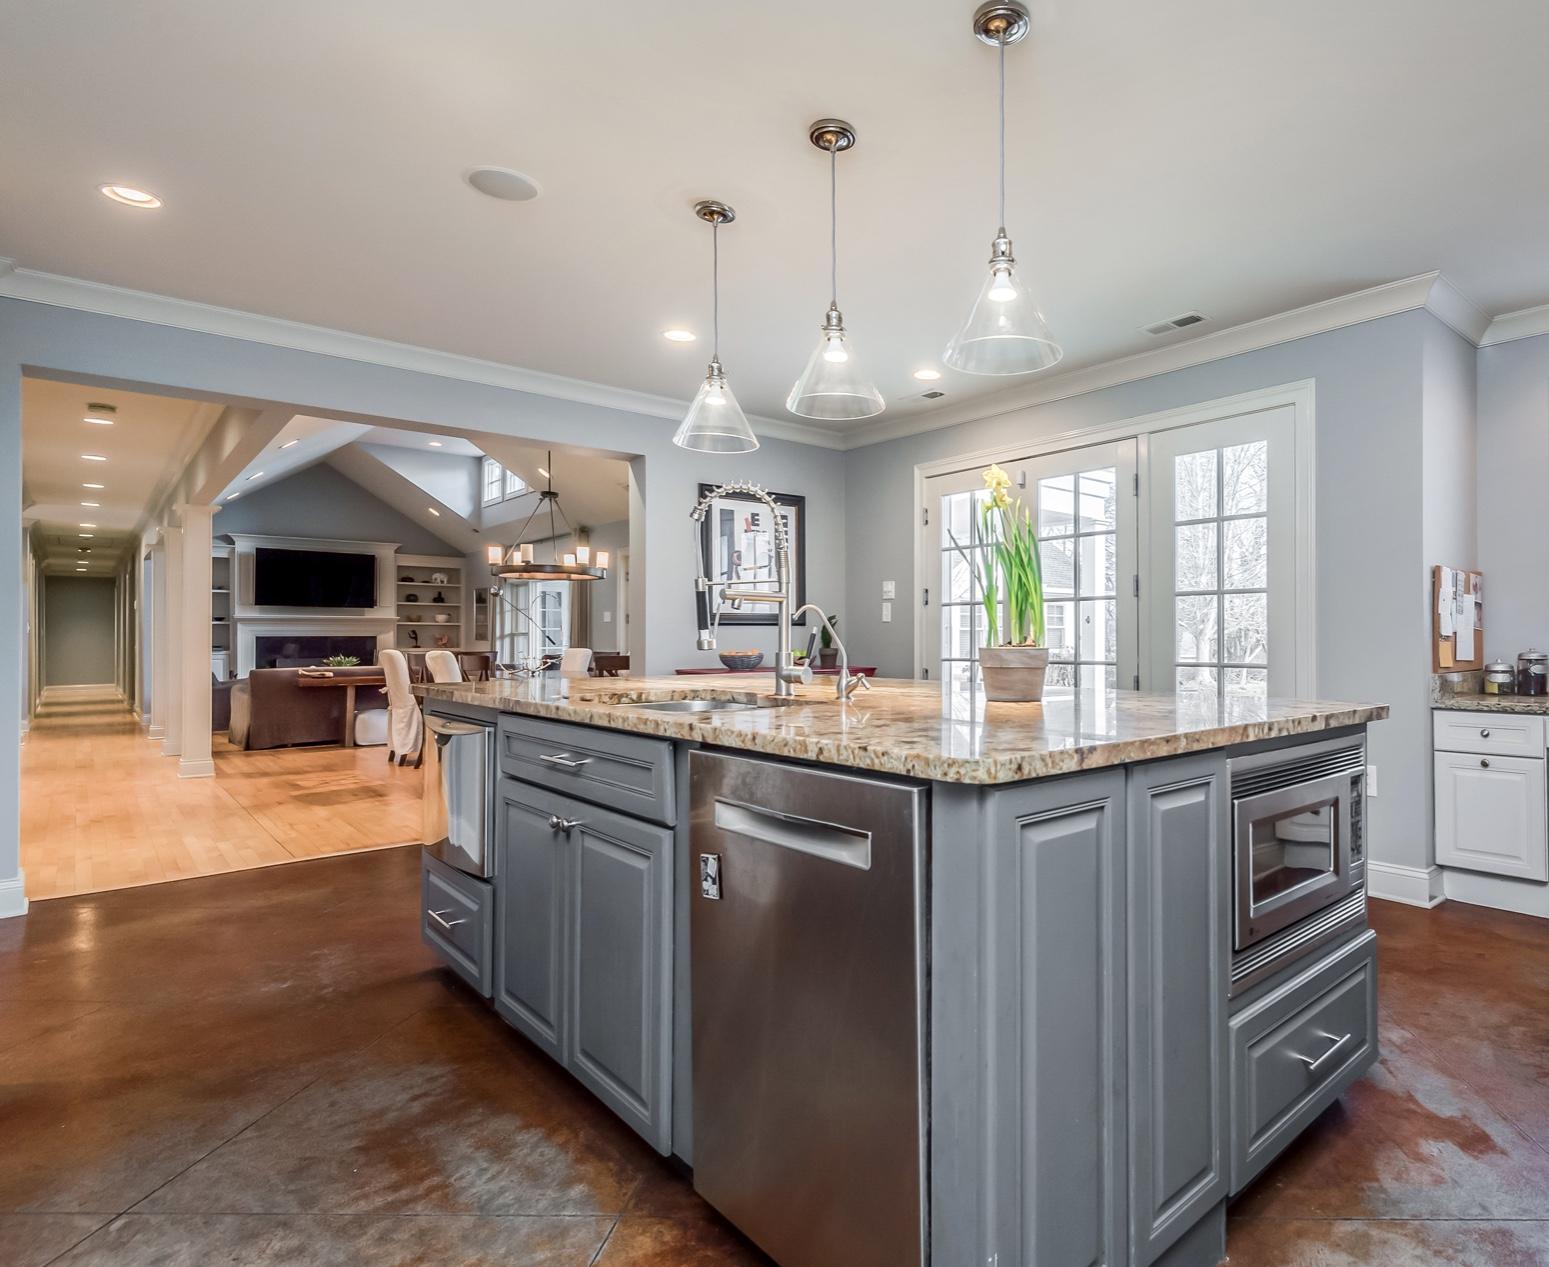 6612StoneMill-kitchen into DRedited-Pixl